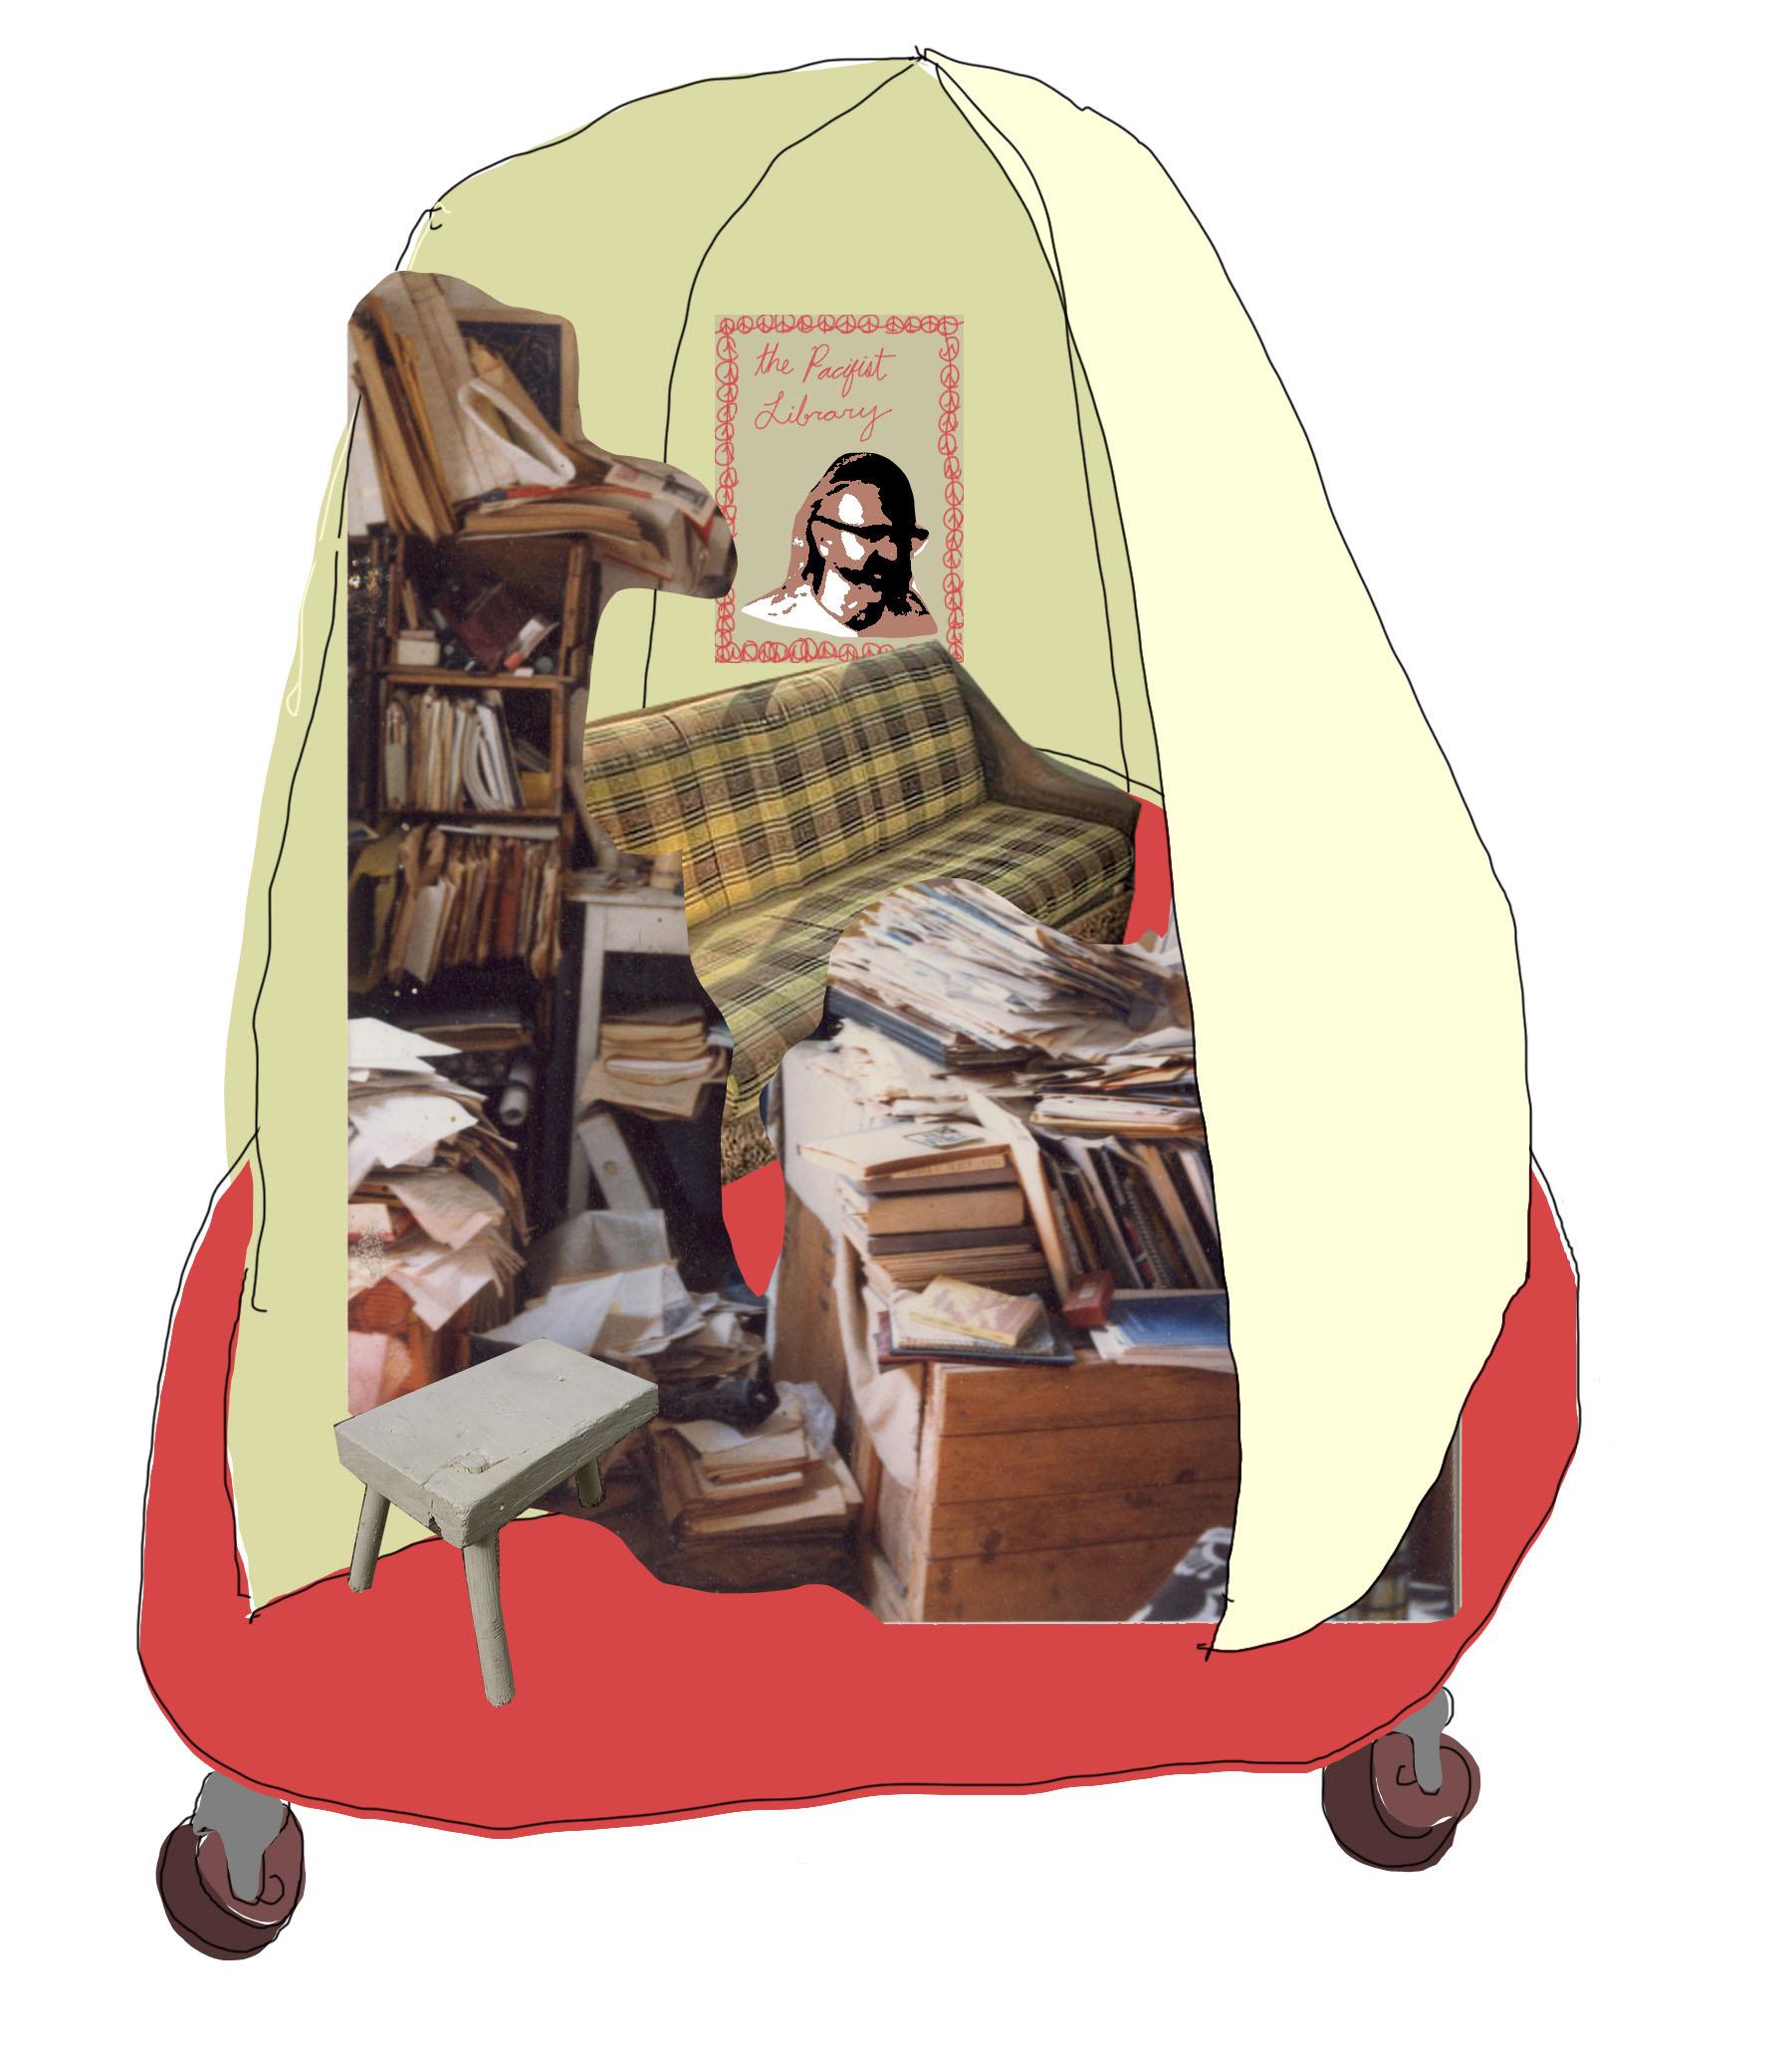 The Pacifist Library By Nathaniel Katz & Valentina Curandi